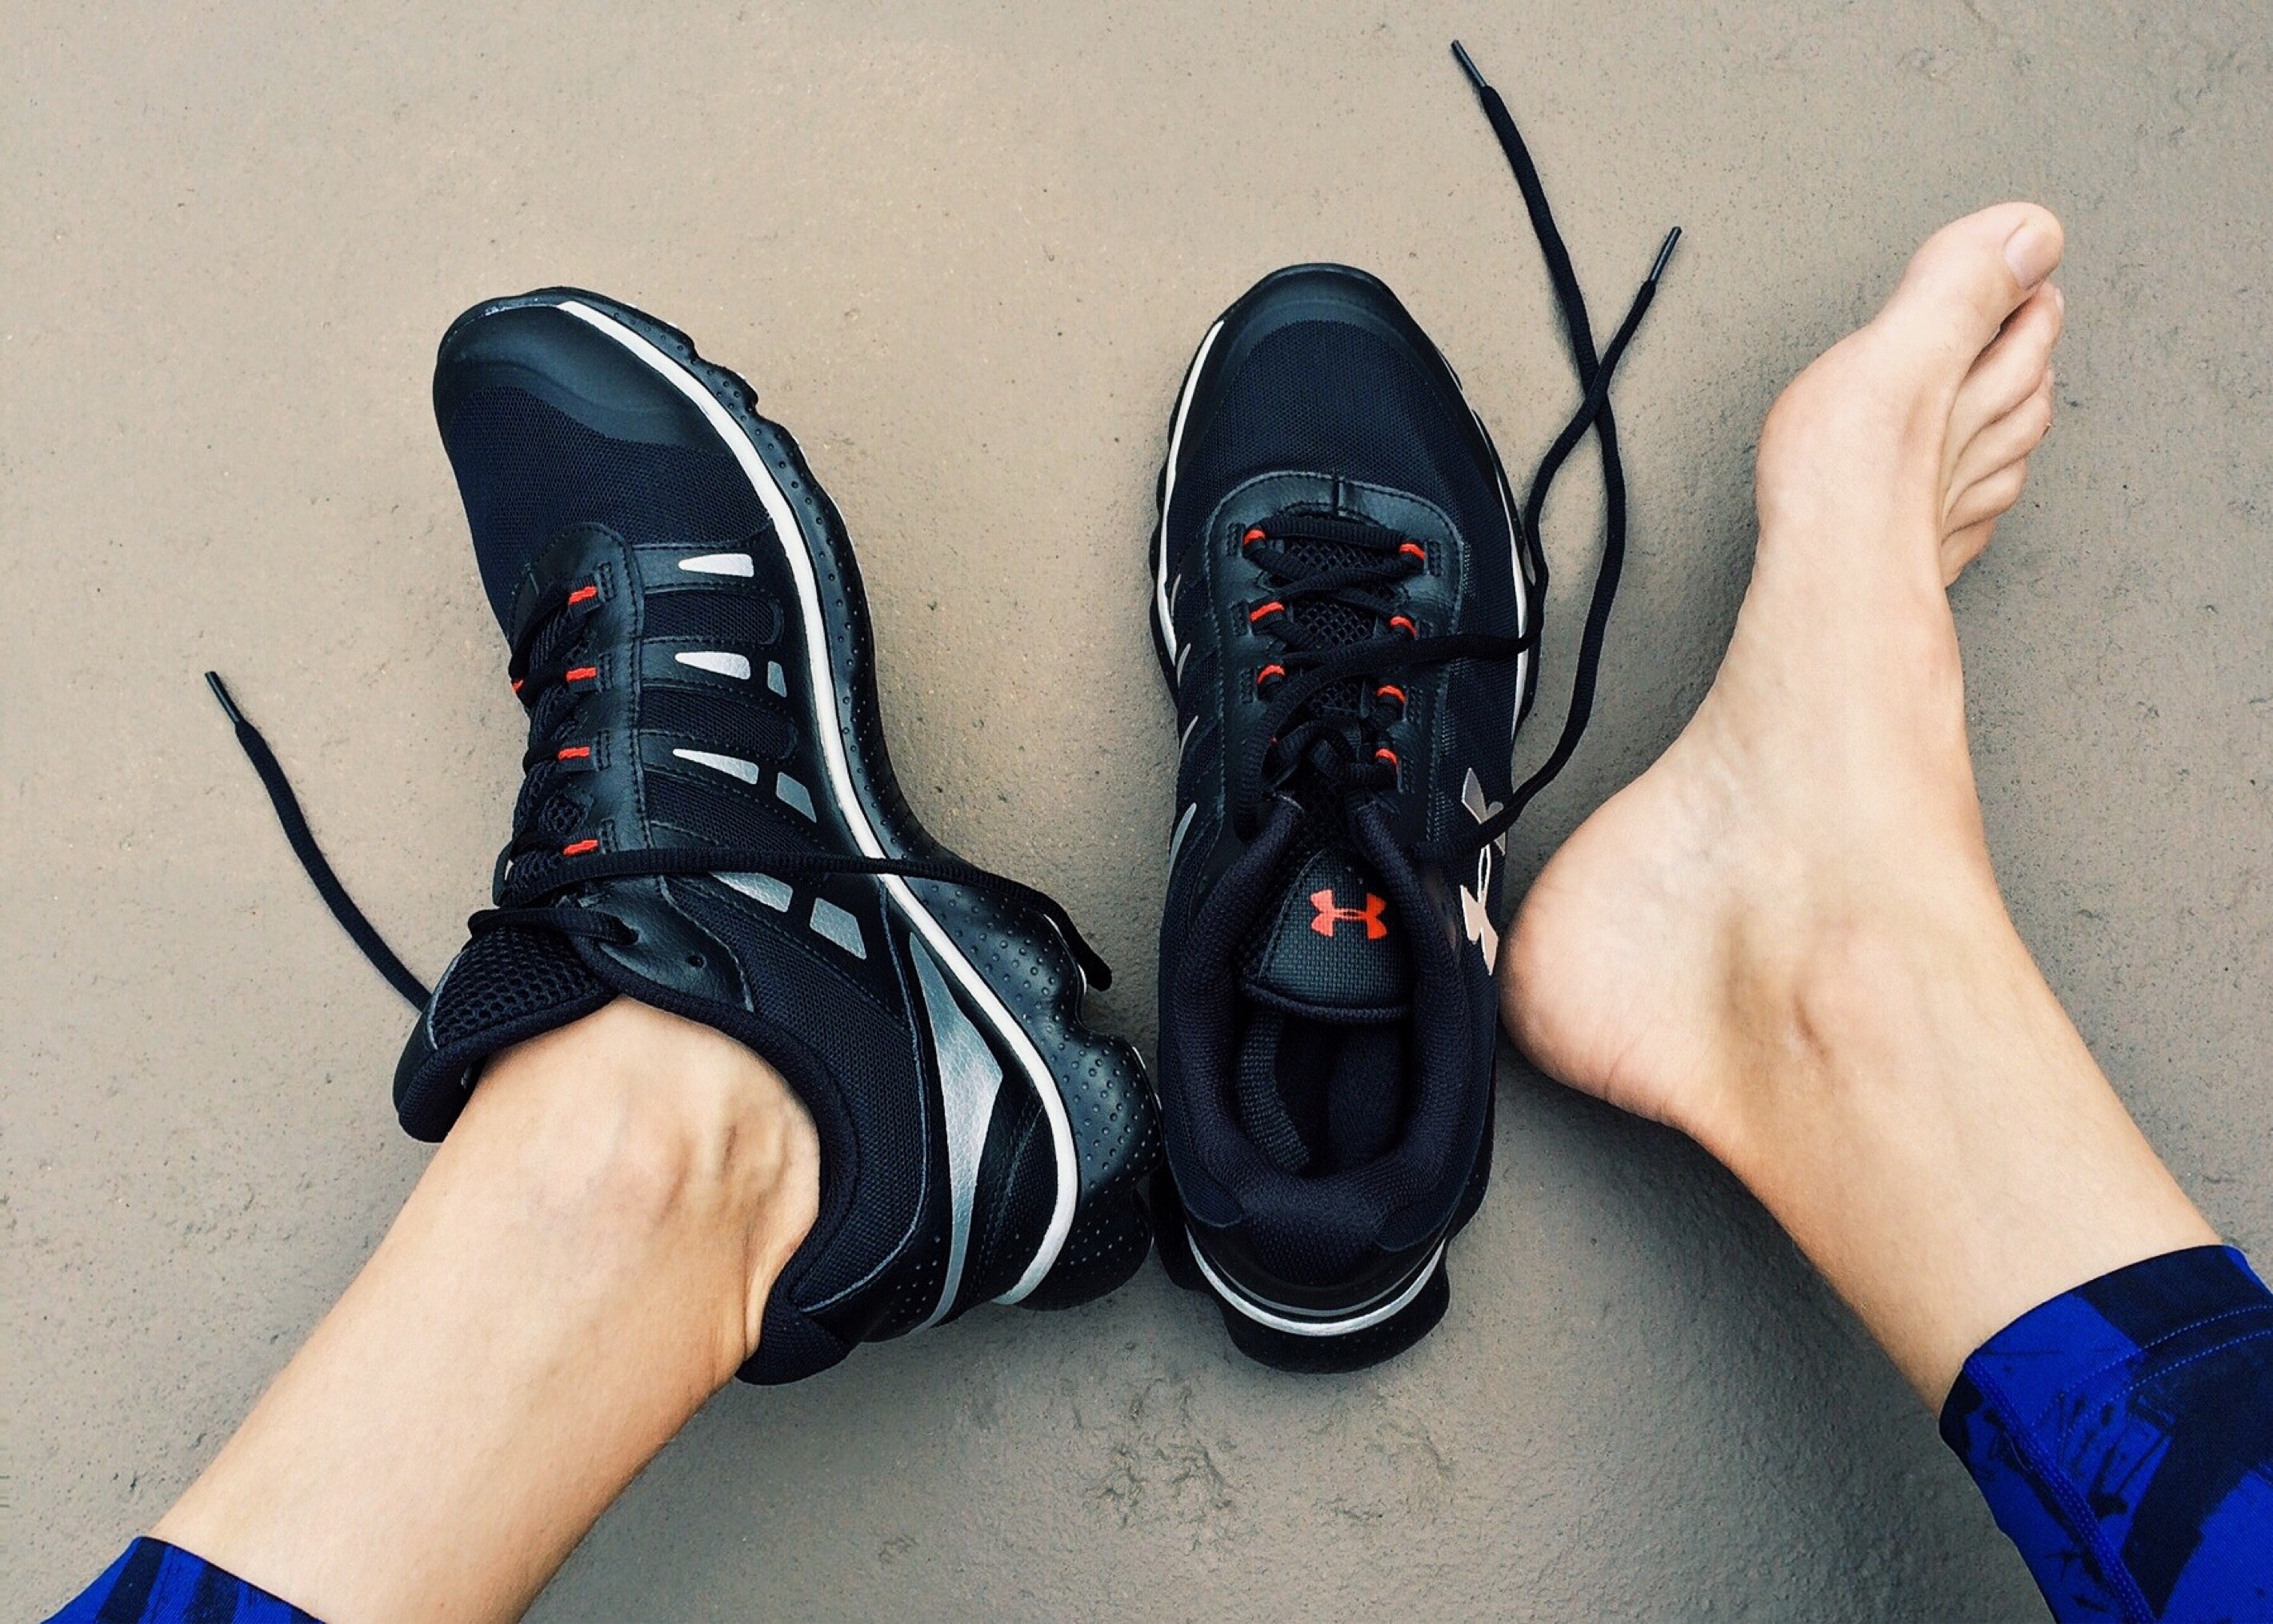 maratón tréning beh